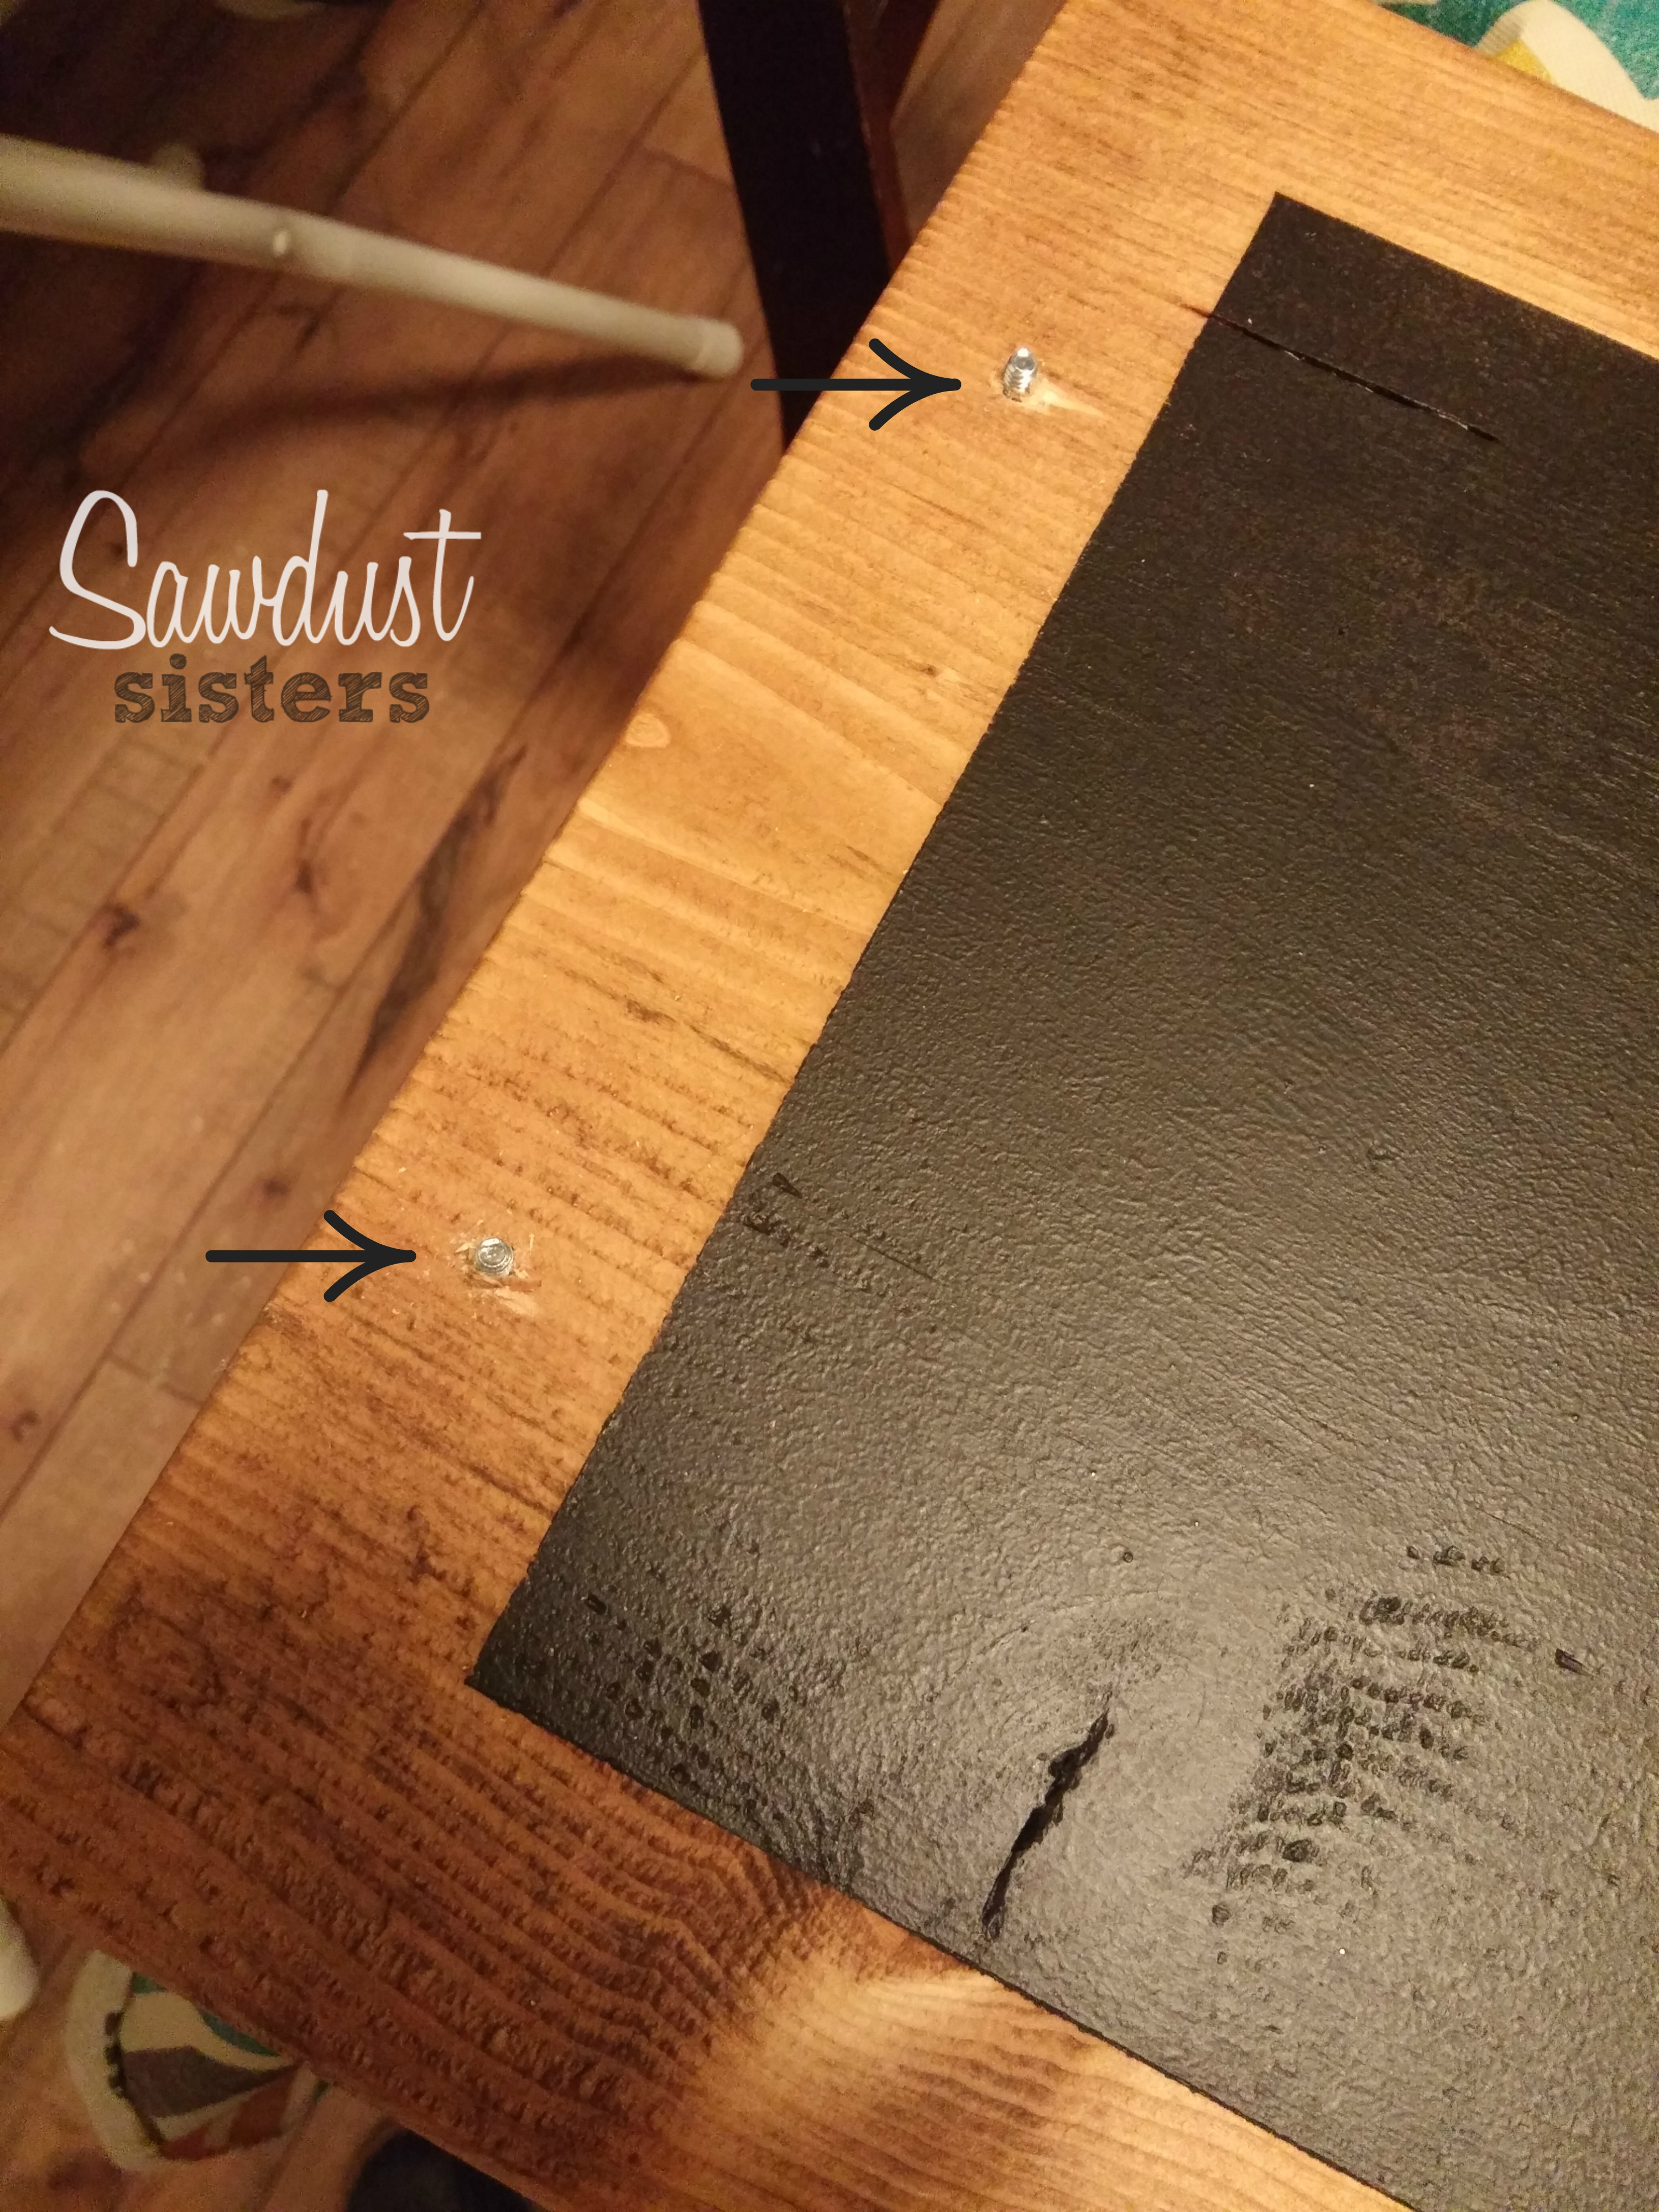 DIY Chalkboard Tray! So Easy! Making it this weekend! Sawdustsisters.com